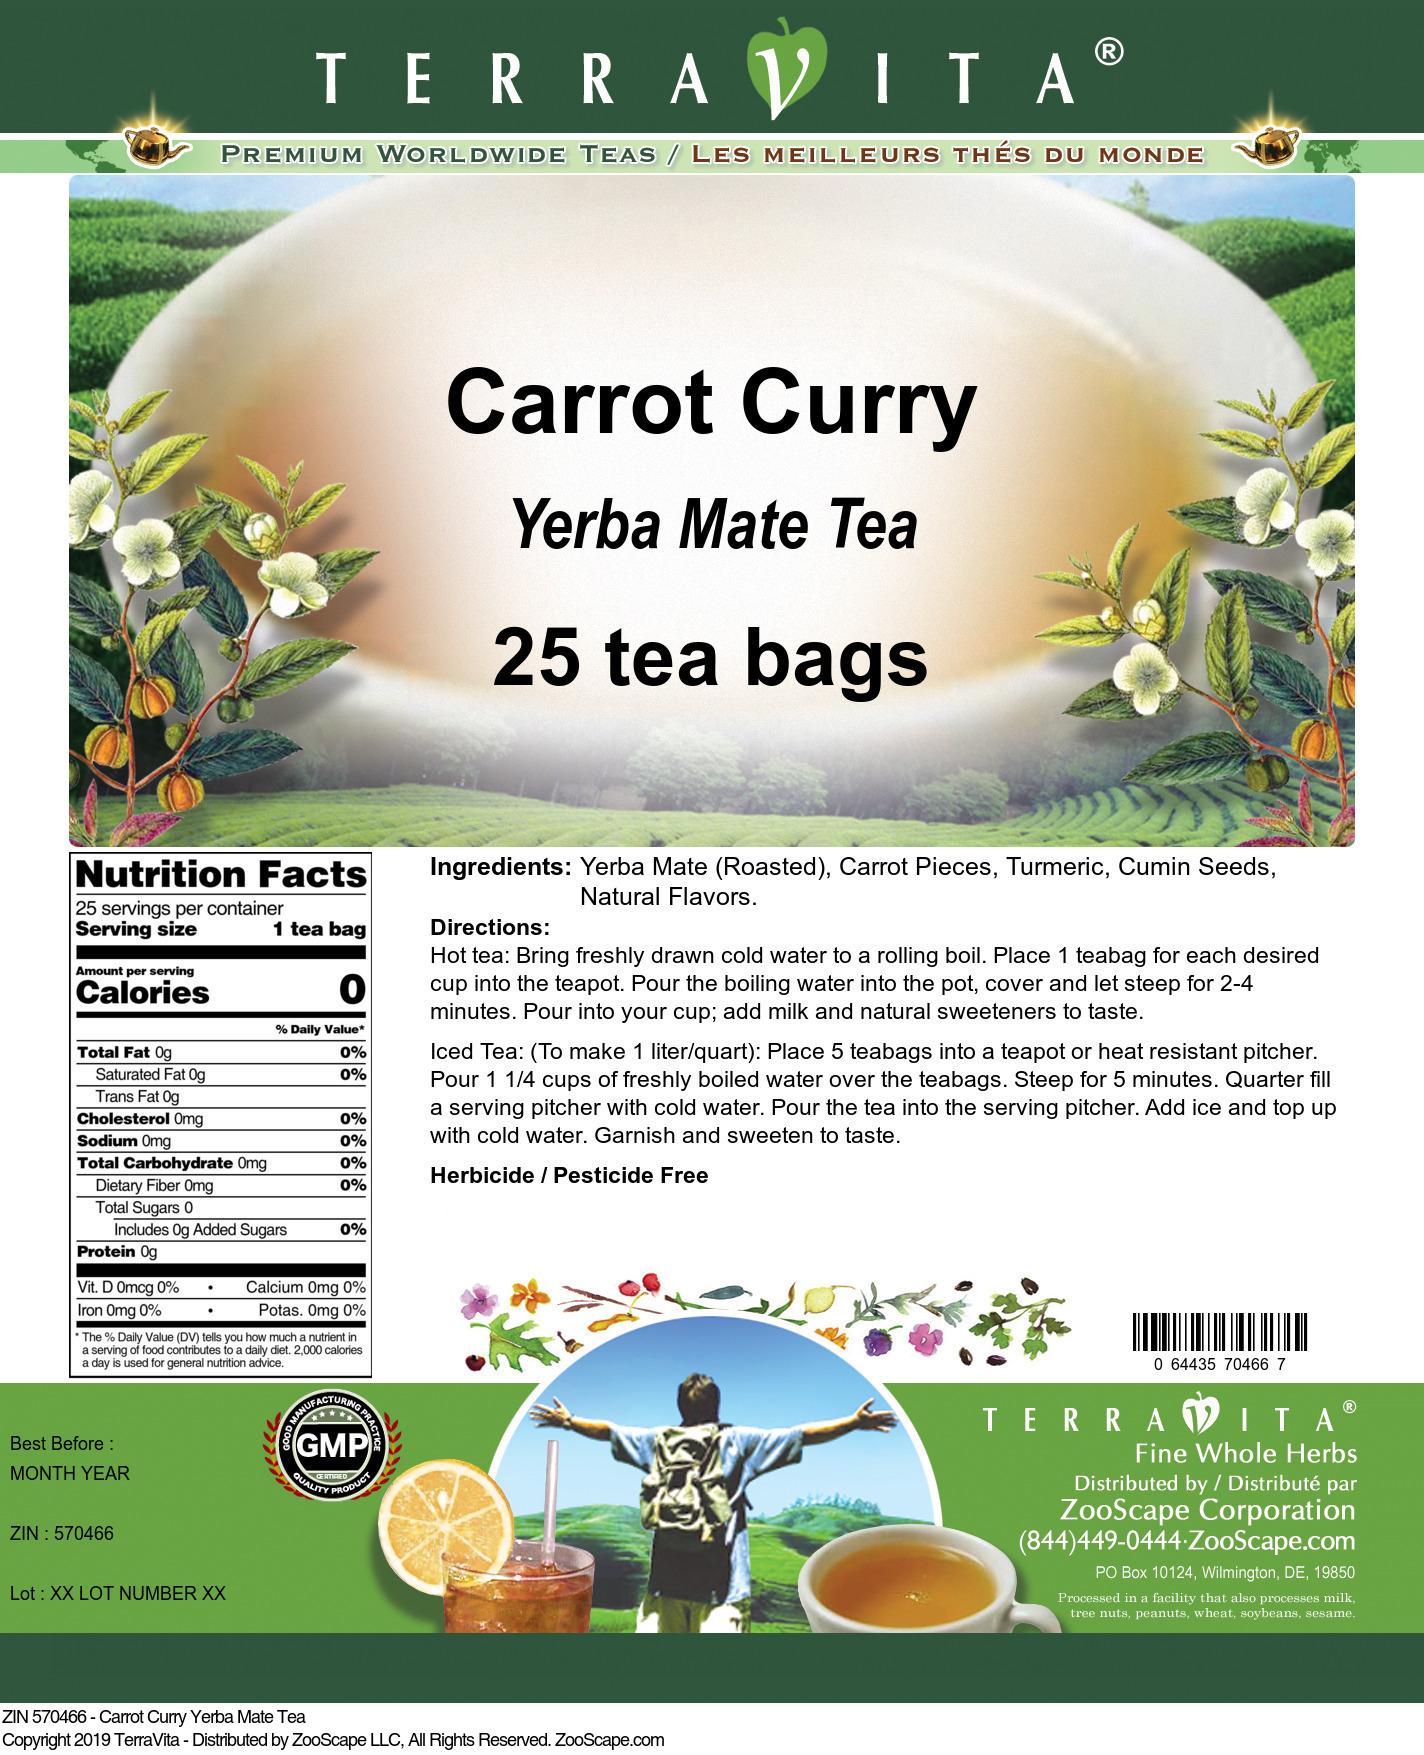 Carrot Curry Yerba Mate